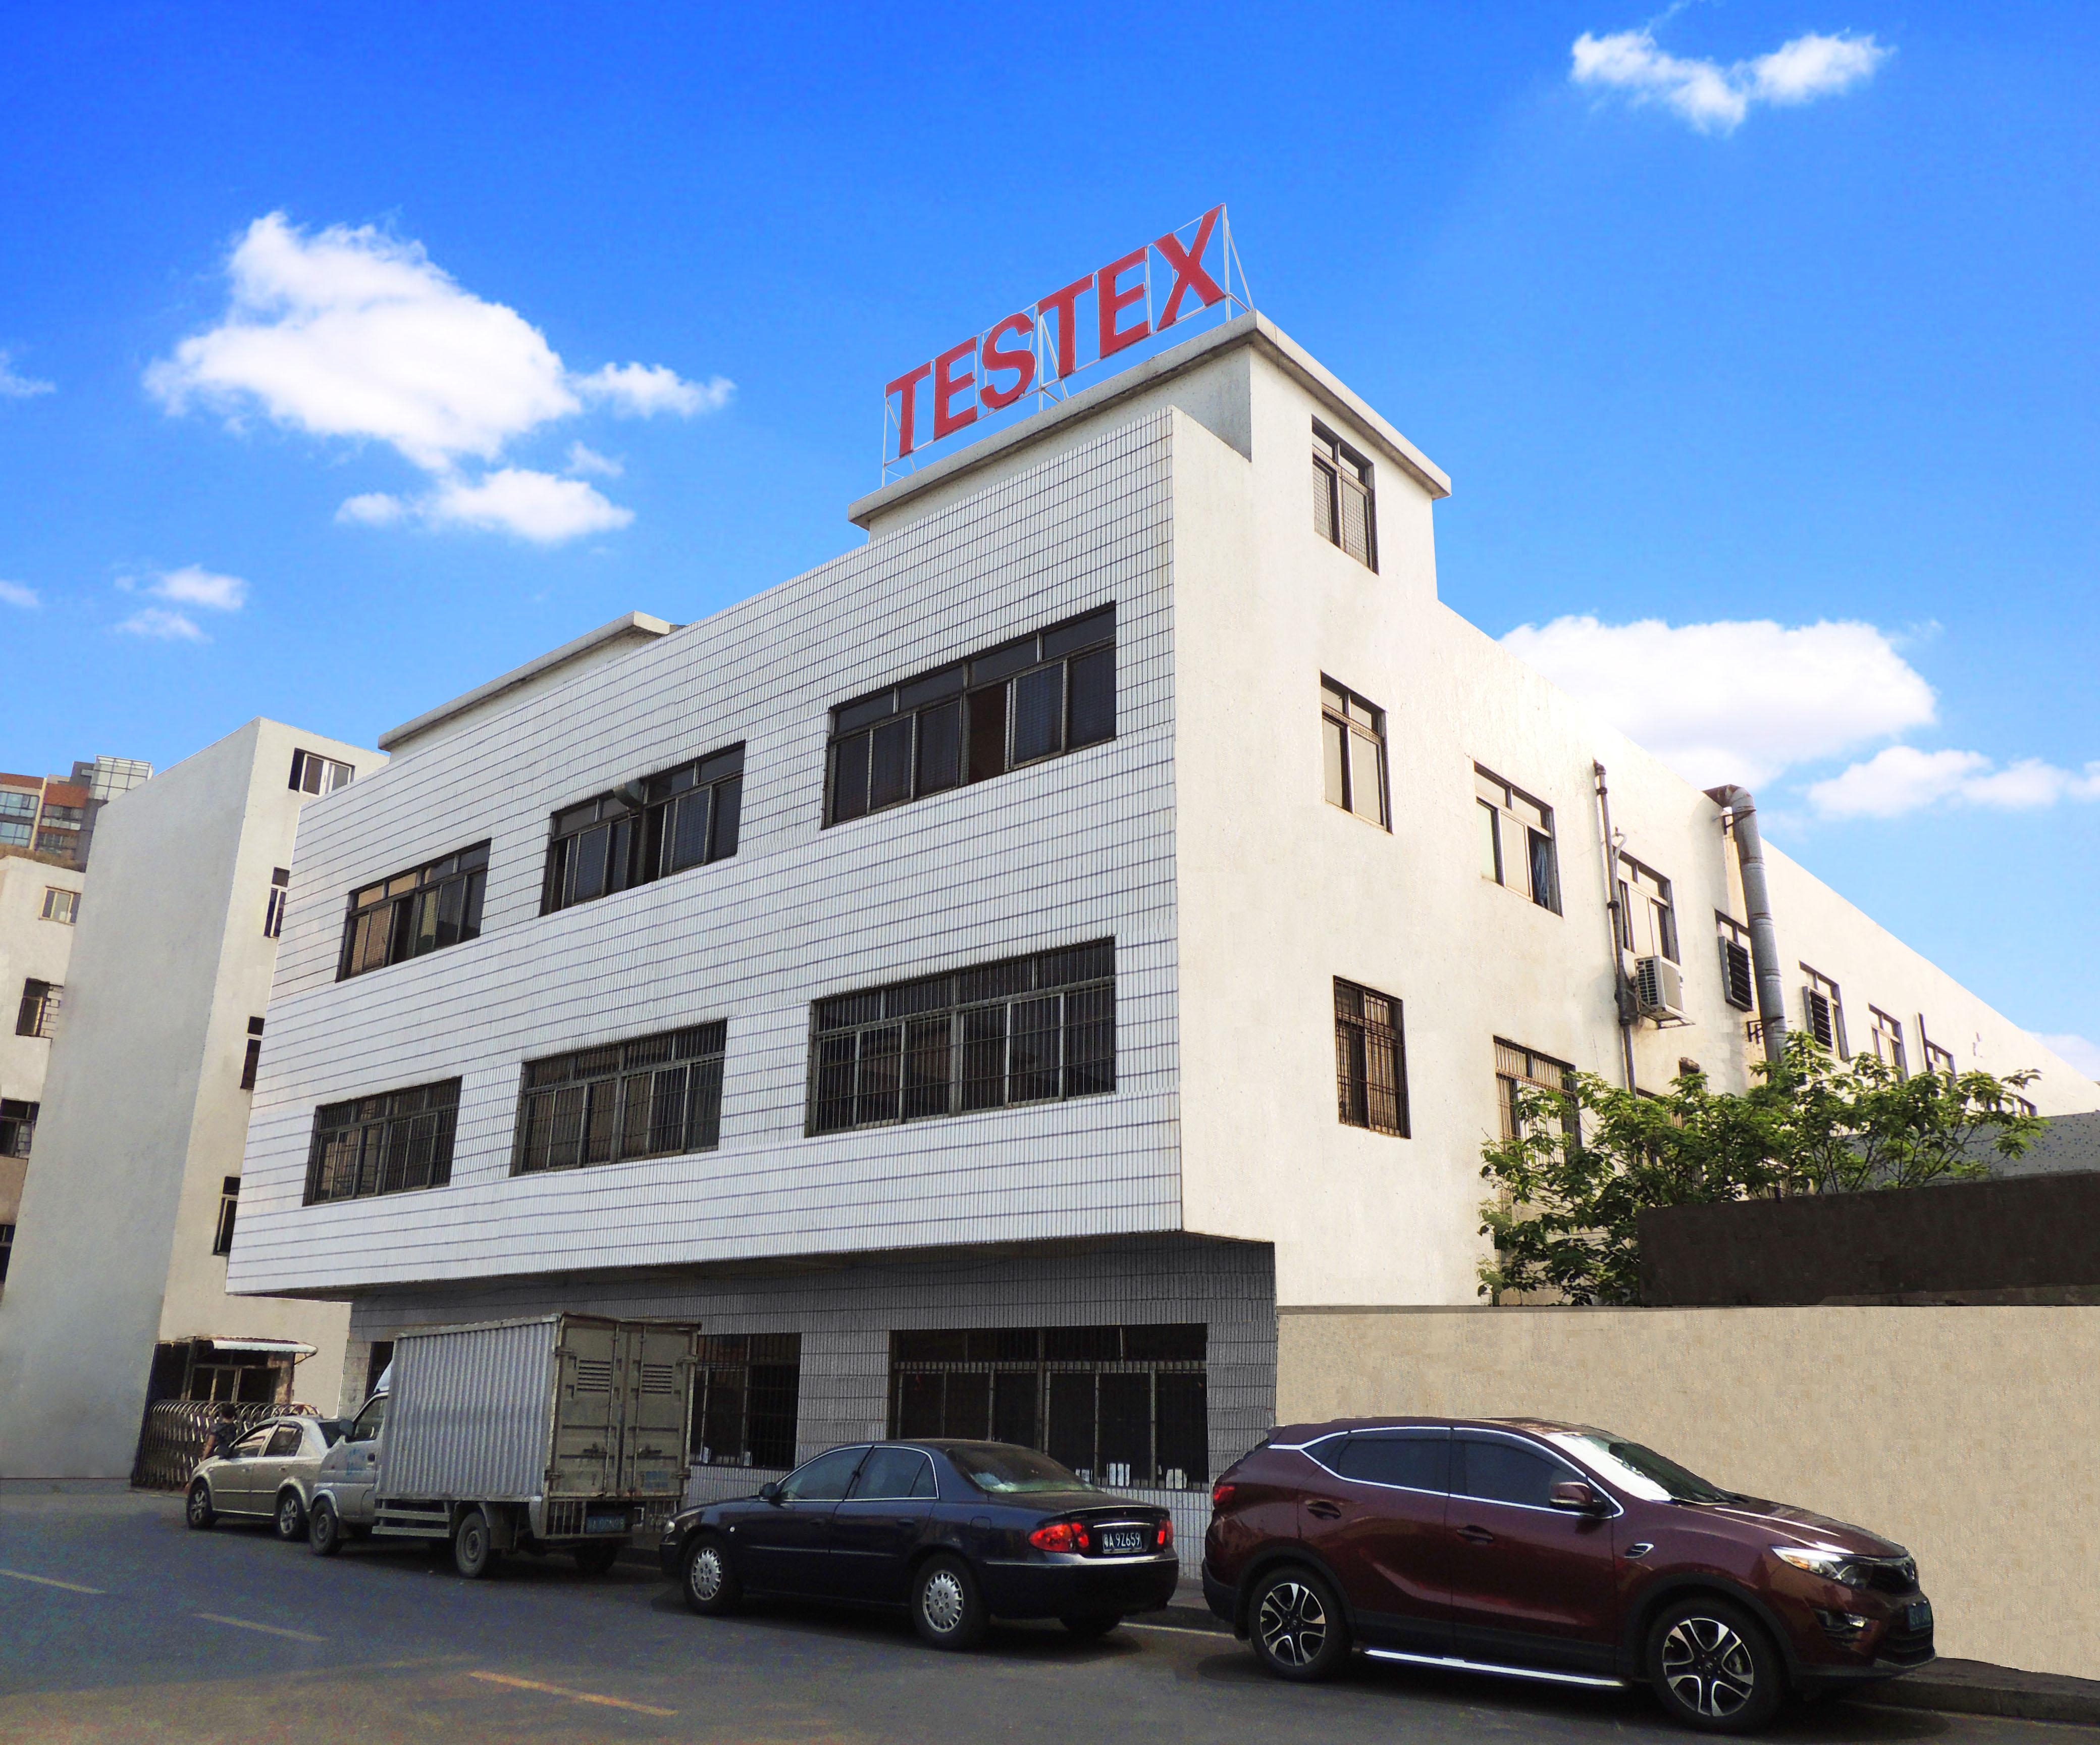 Testex Factory Building